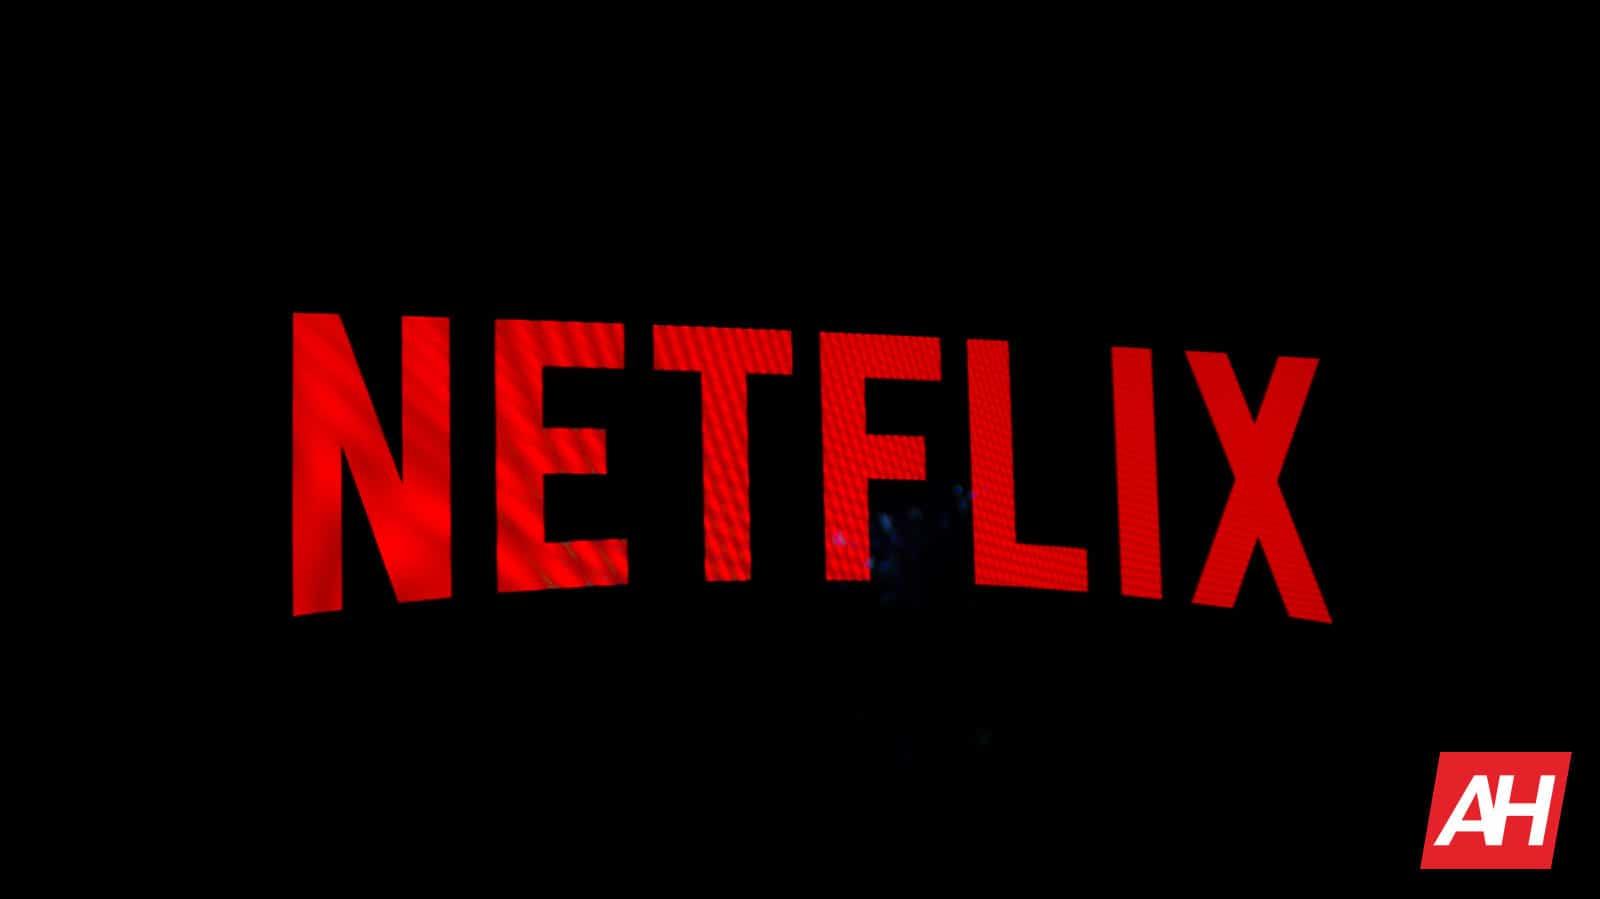 Netflix AH NS 10